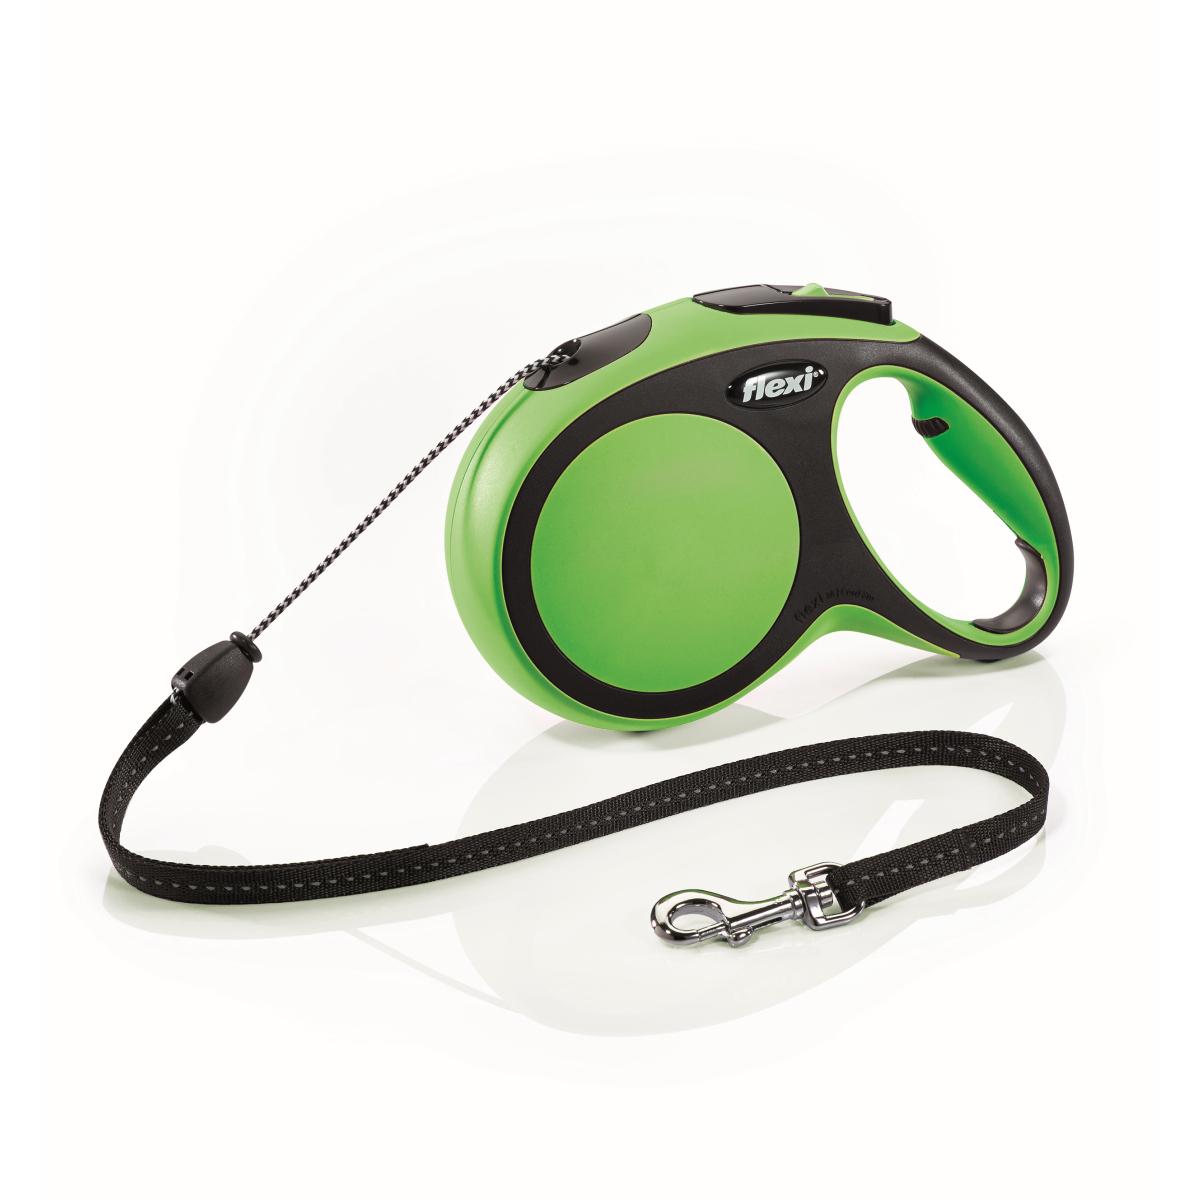 Flexi - new comfort cord m - 8 m groen